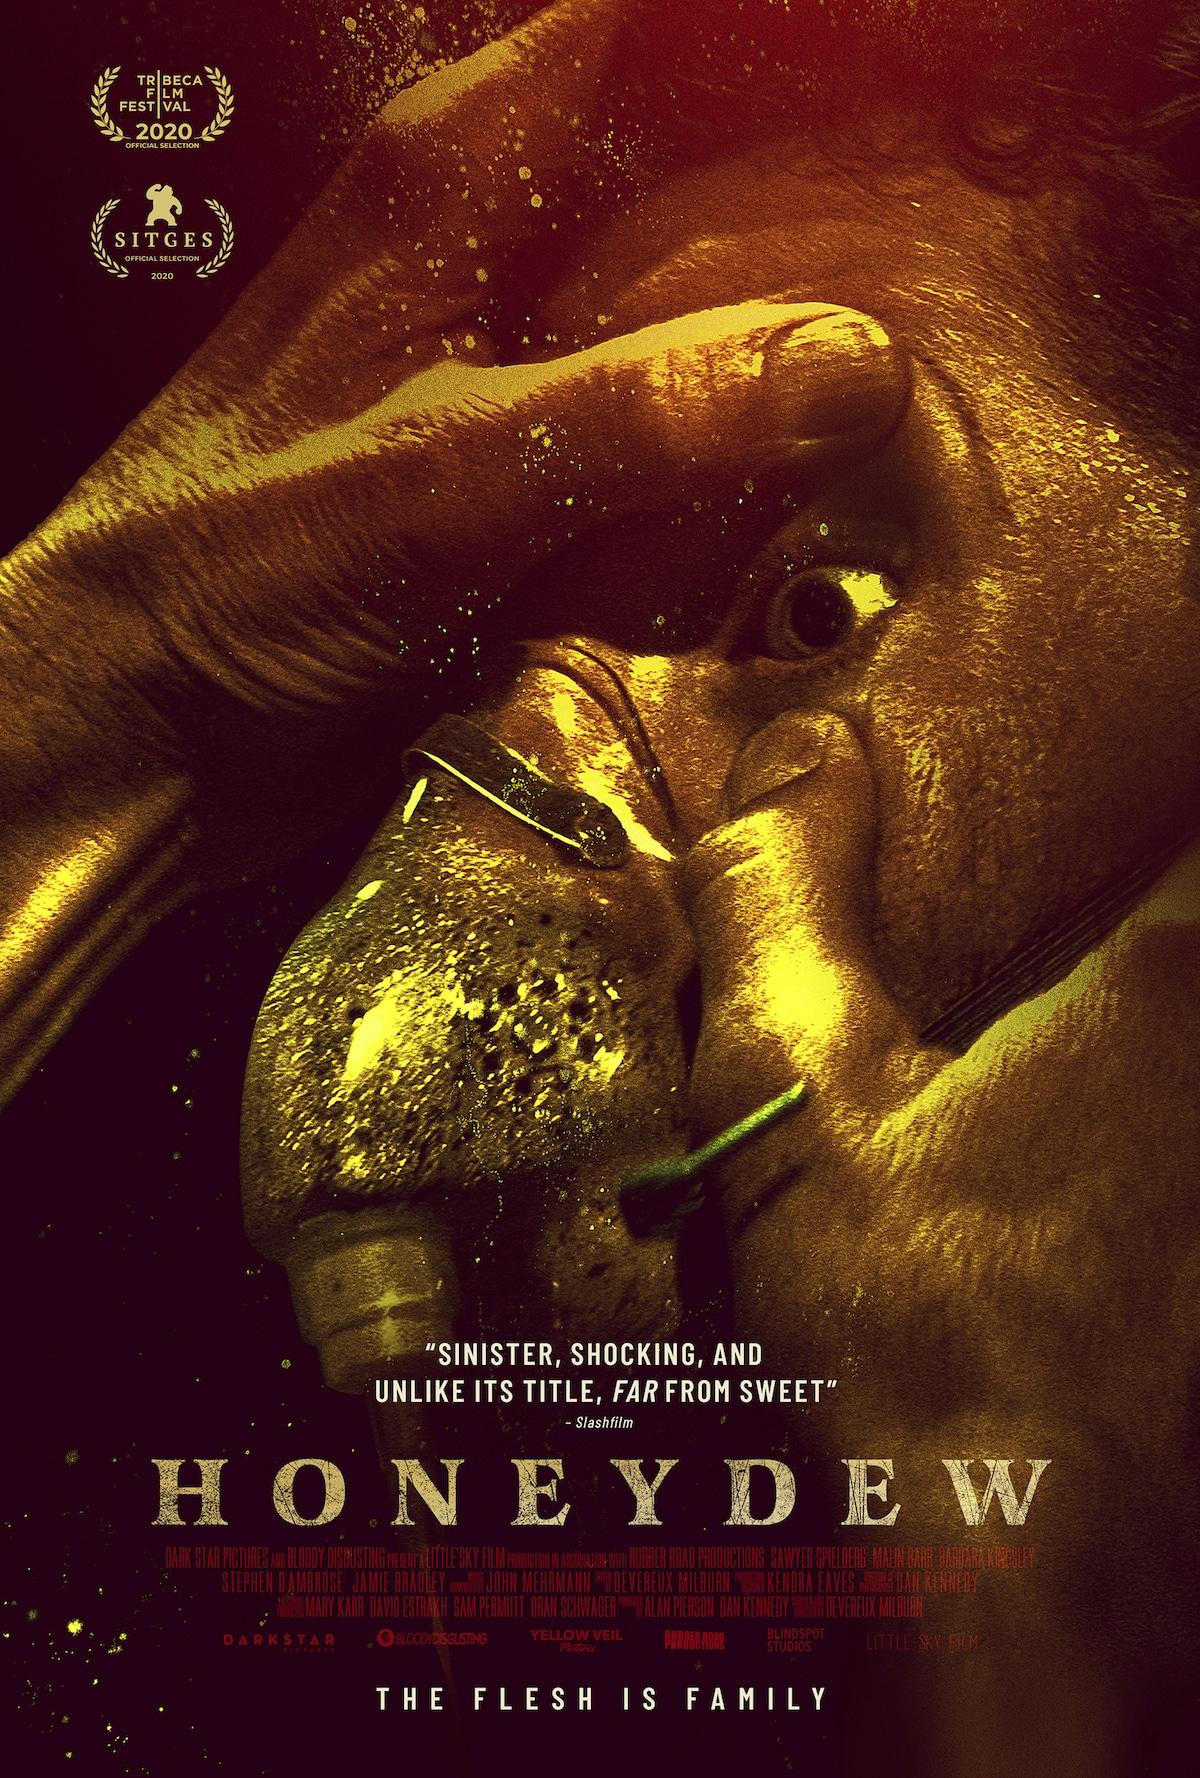 Honeydew – Teaser Poster